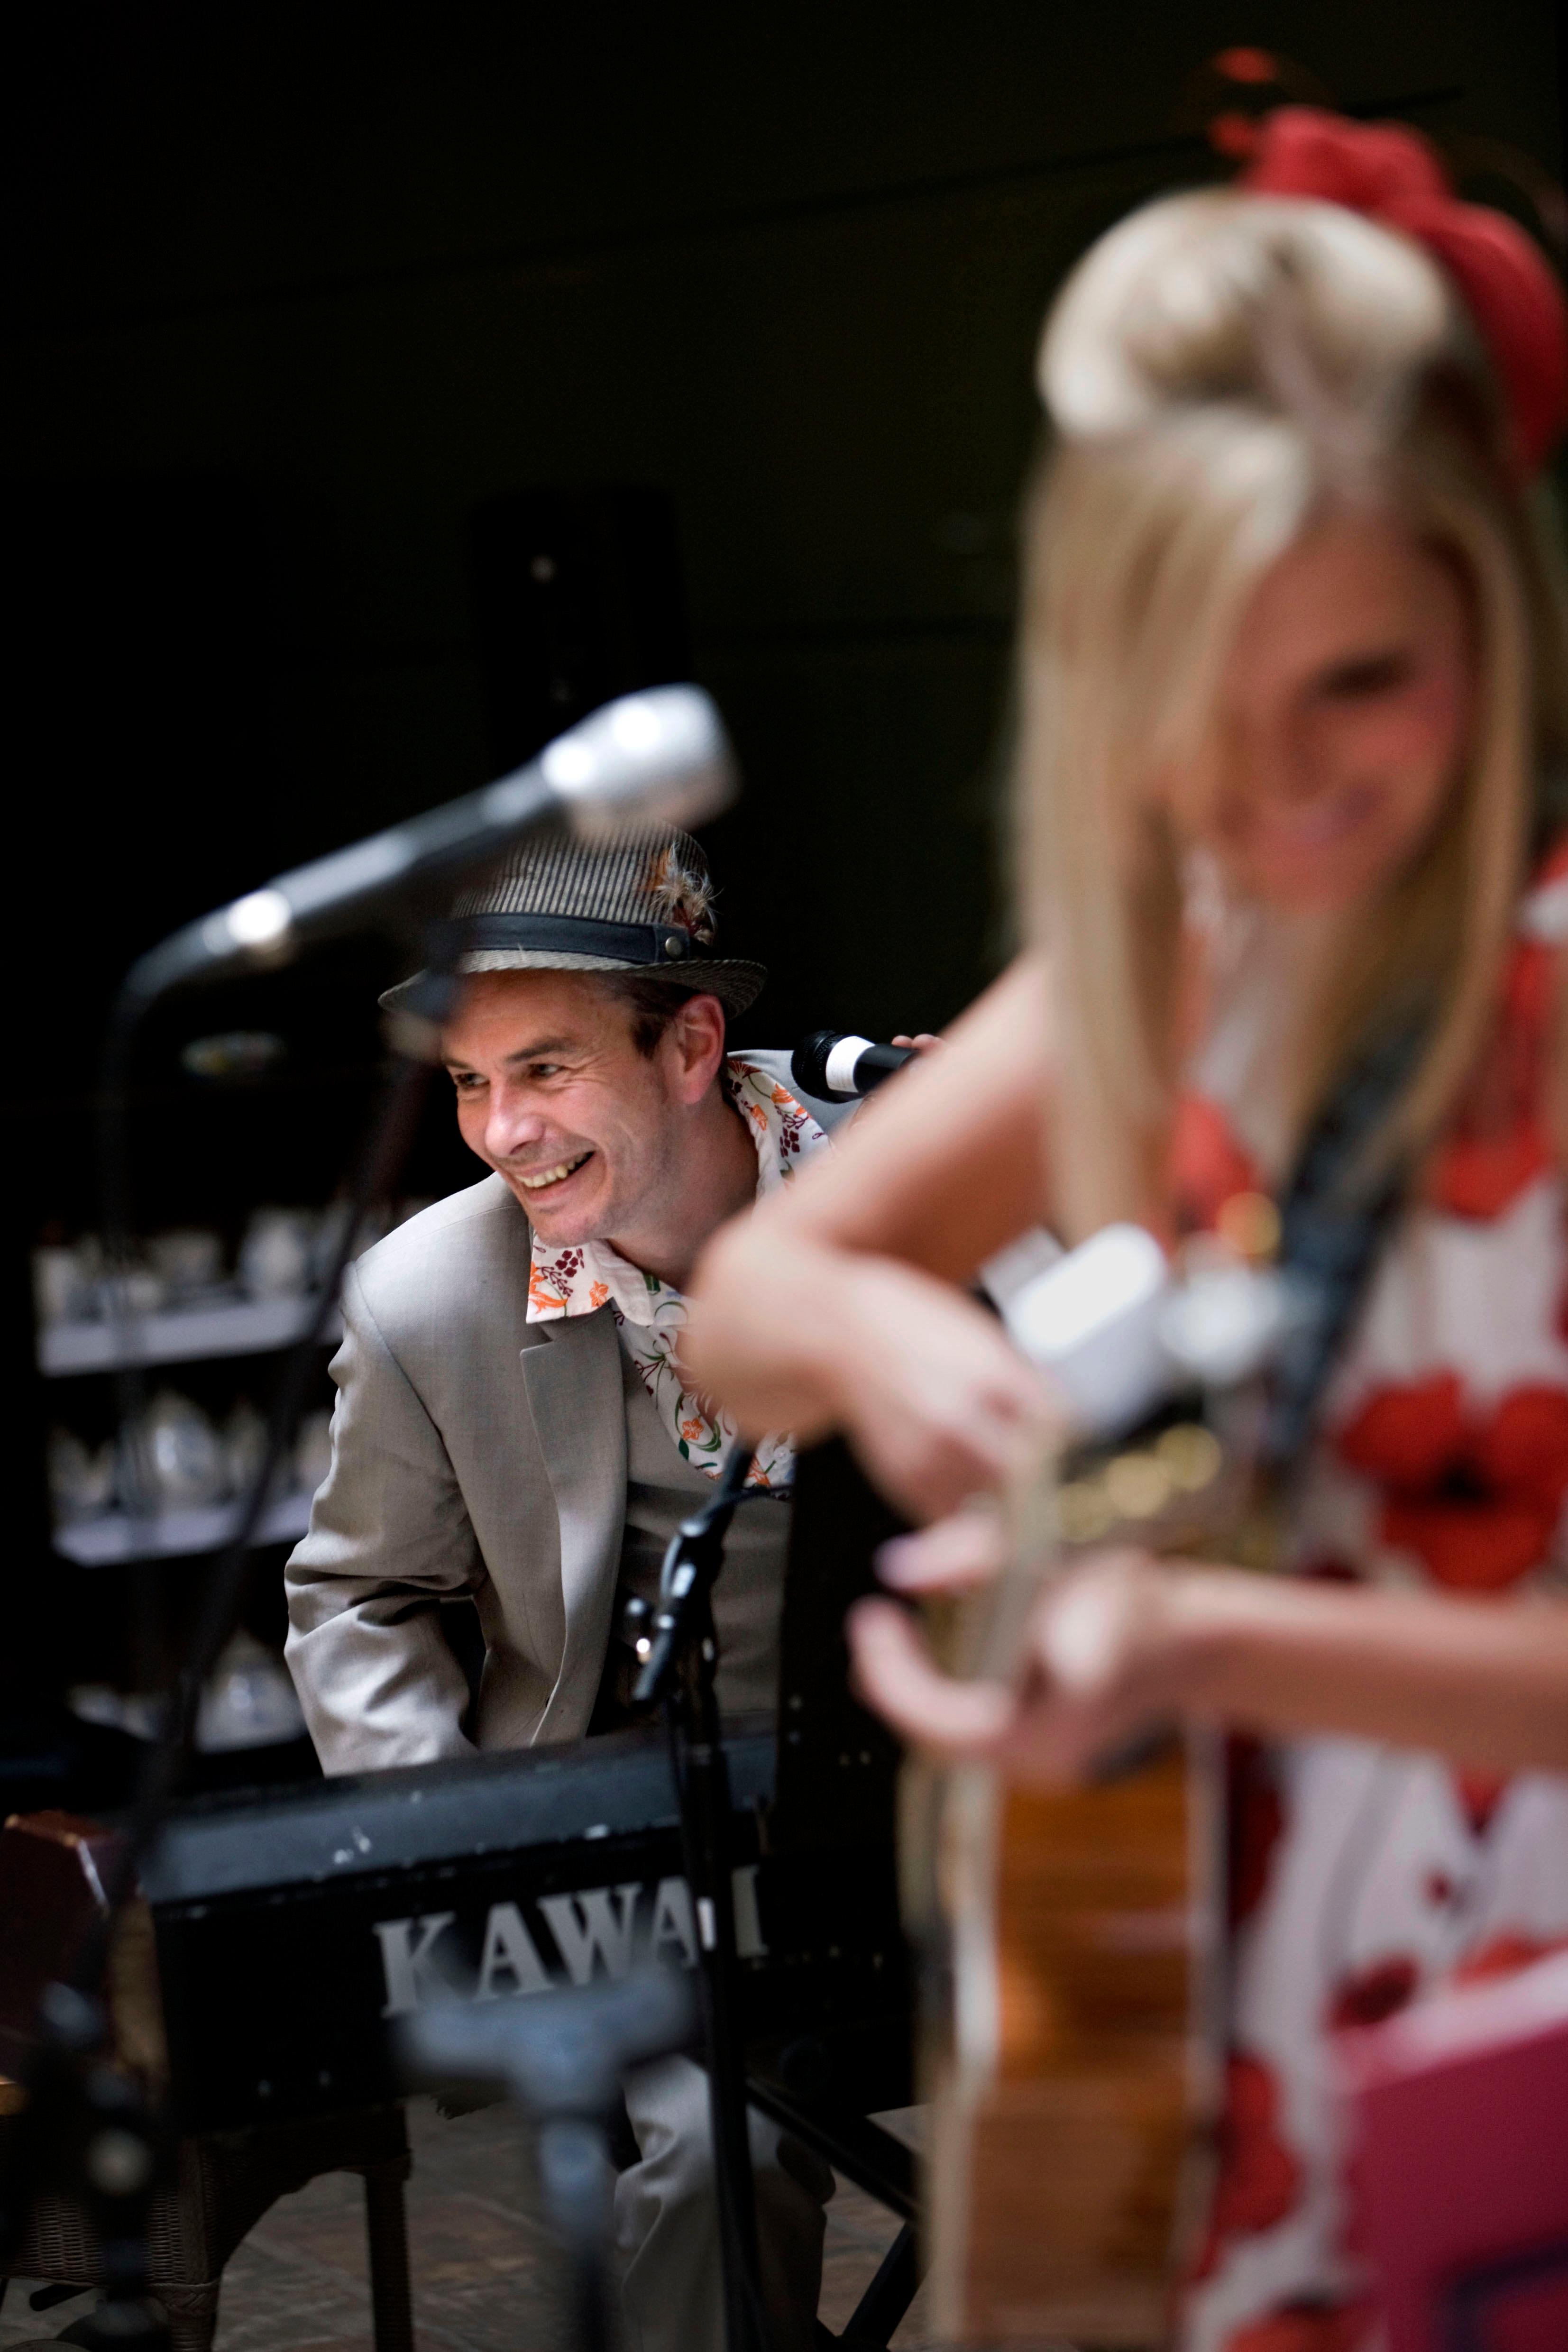 England, Birmingham, 30-06-11 Live recording of Tipitina at Hotel du Vin. © Foto Merlin Daleman